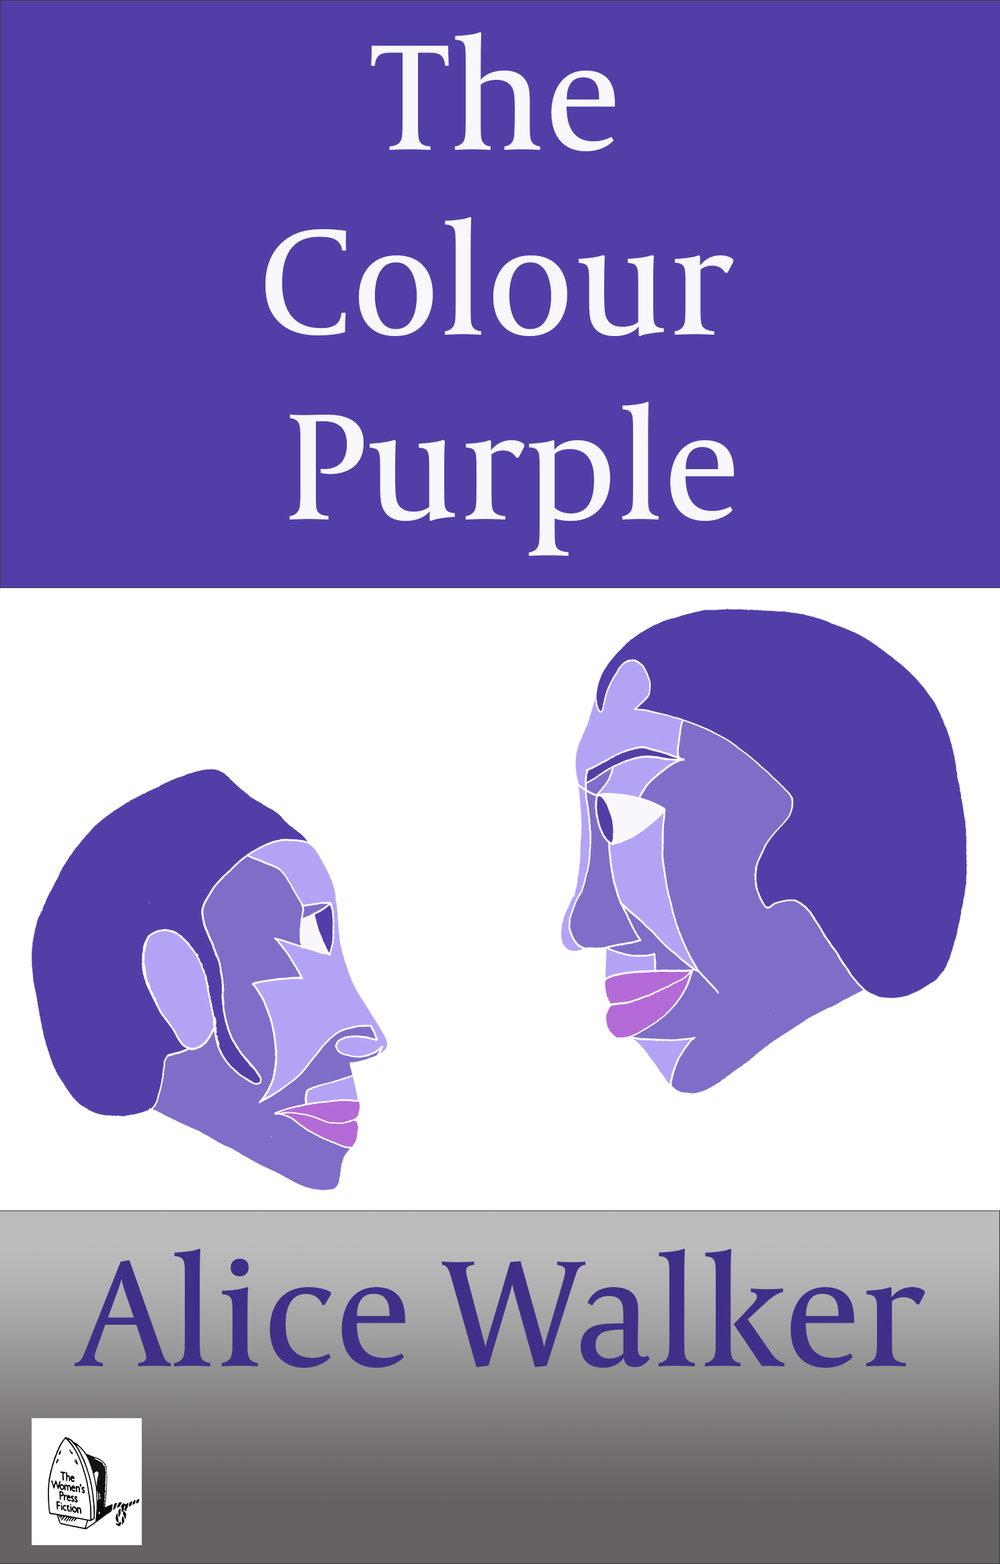 The colour purple cover 4.jpg